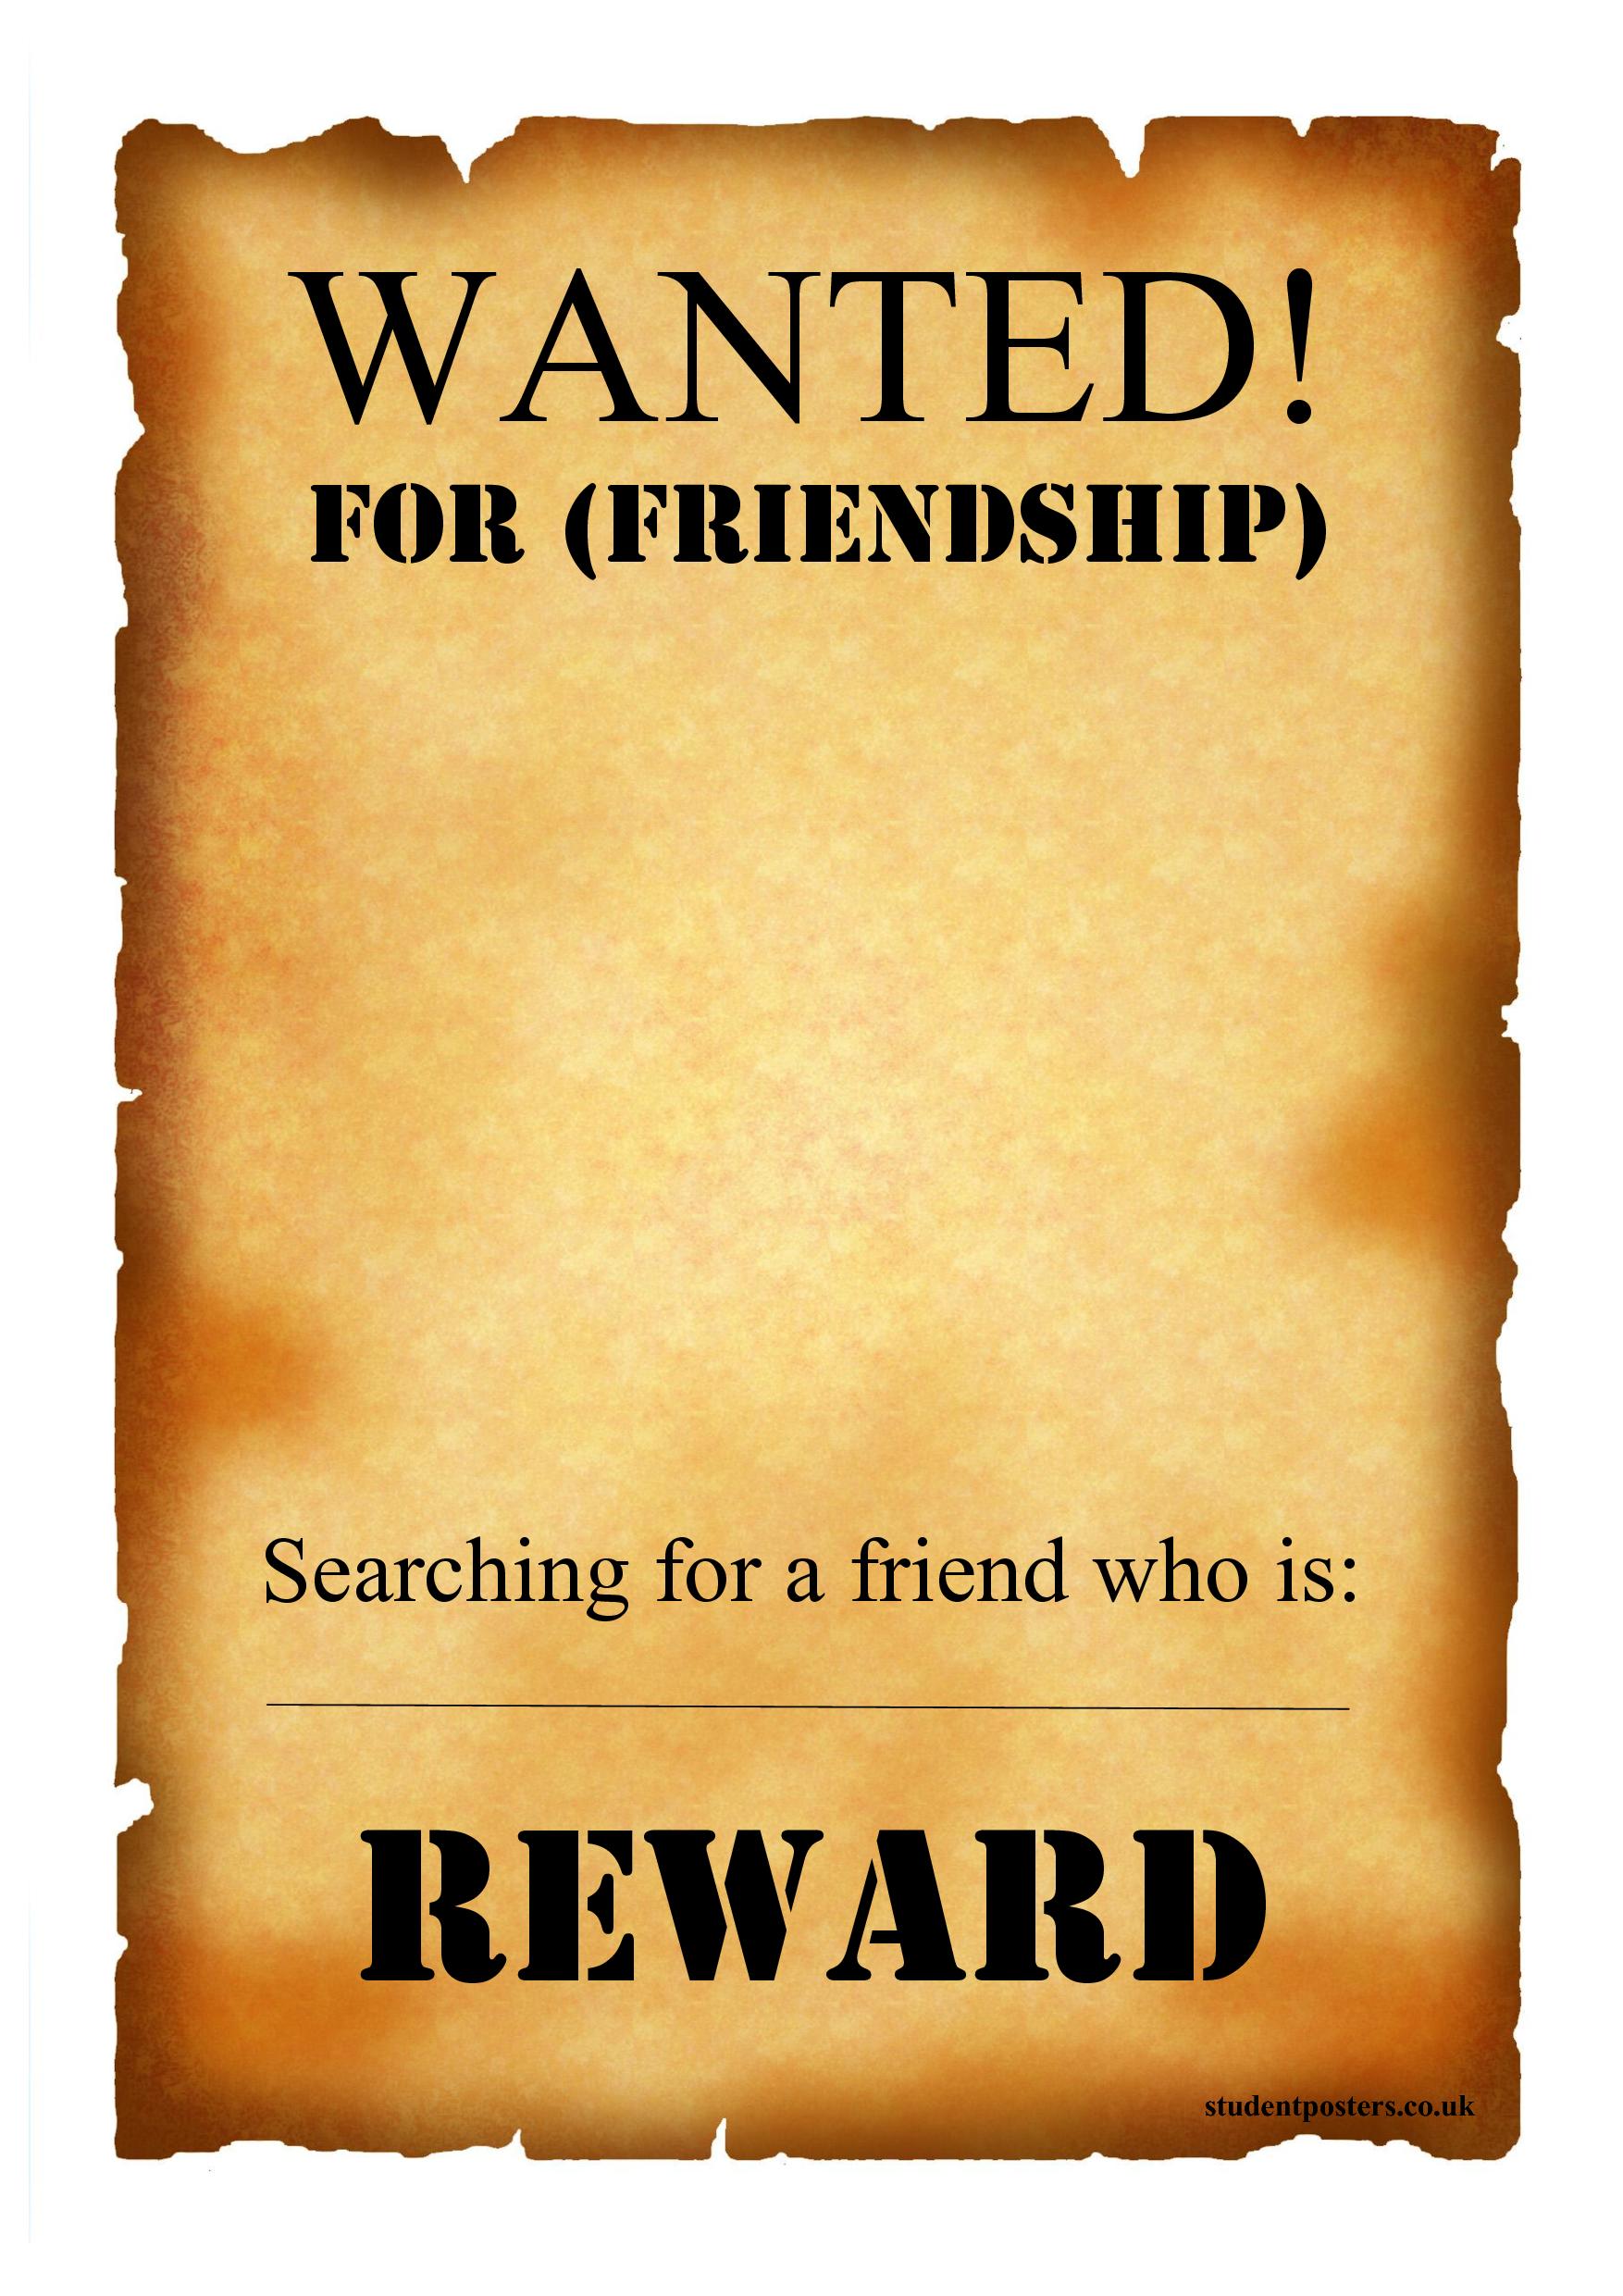 Wanted Poster Template Wanted Poster Template Repaired Poster Template Debit Card Design Marketing Template